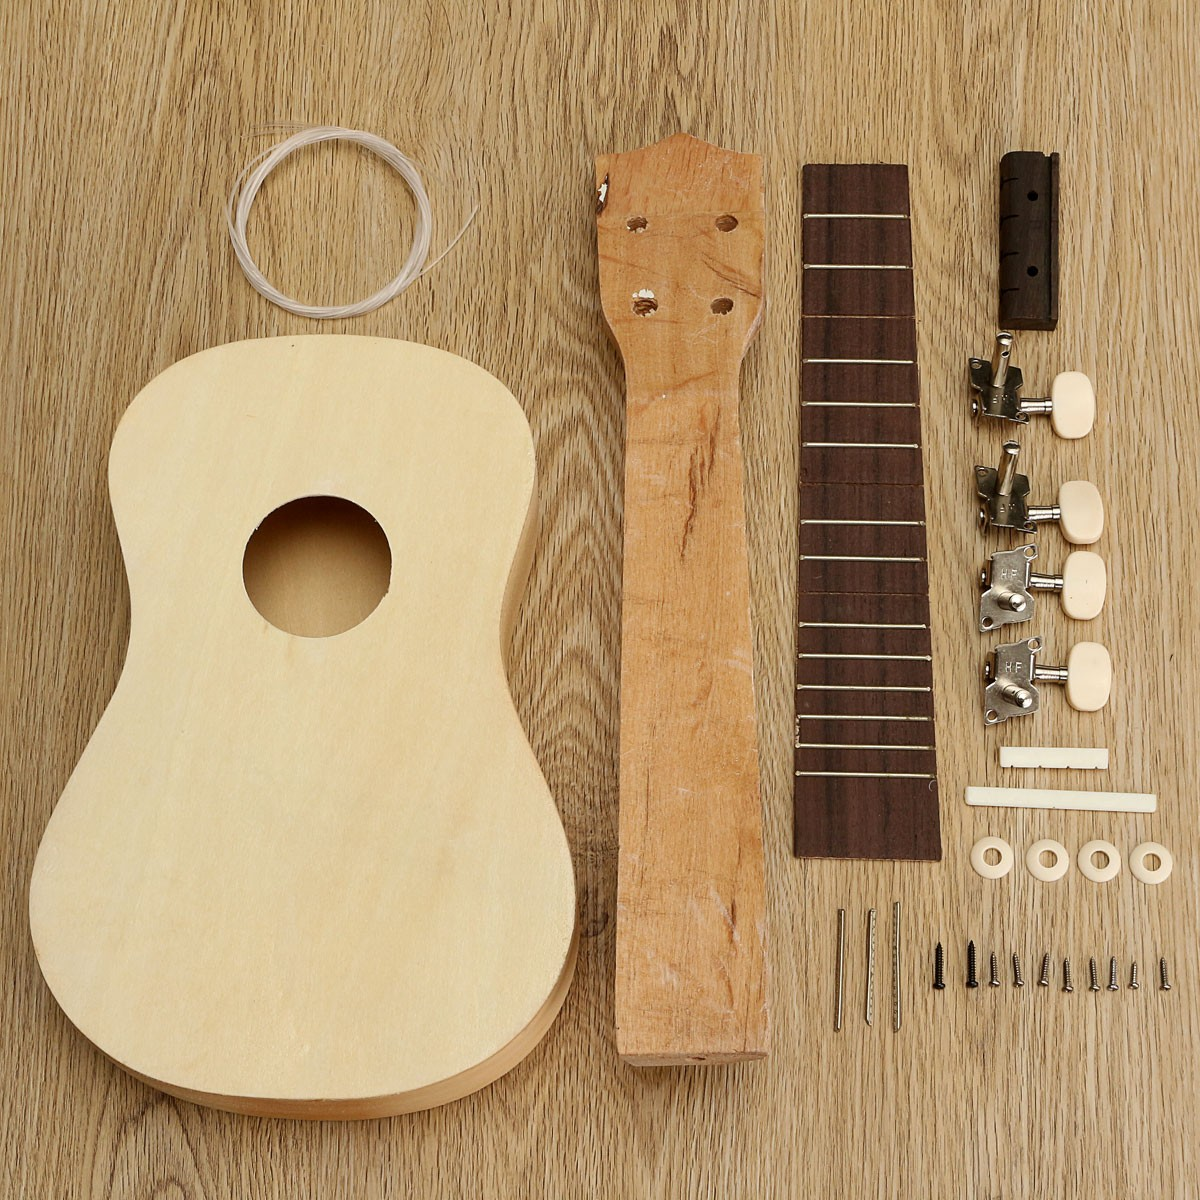 21 self build ukulele diy soprano hawaii ukulele kit musical instrument gift ebay. Black Bedroom Furniture Sets. Home Design Ideas